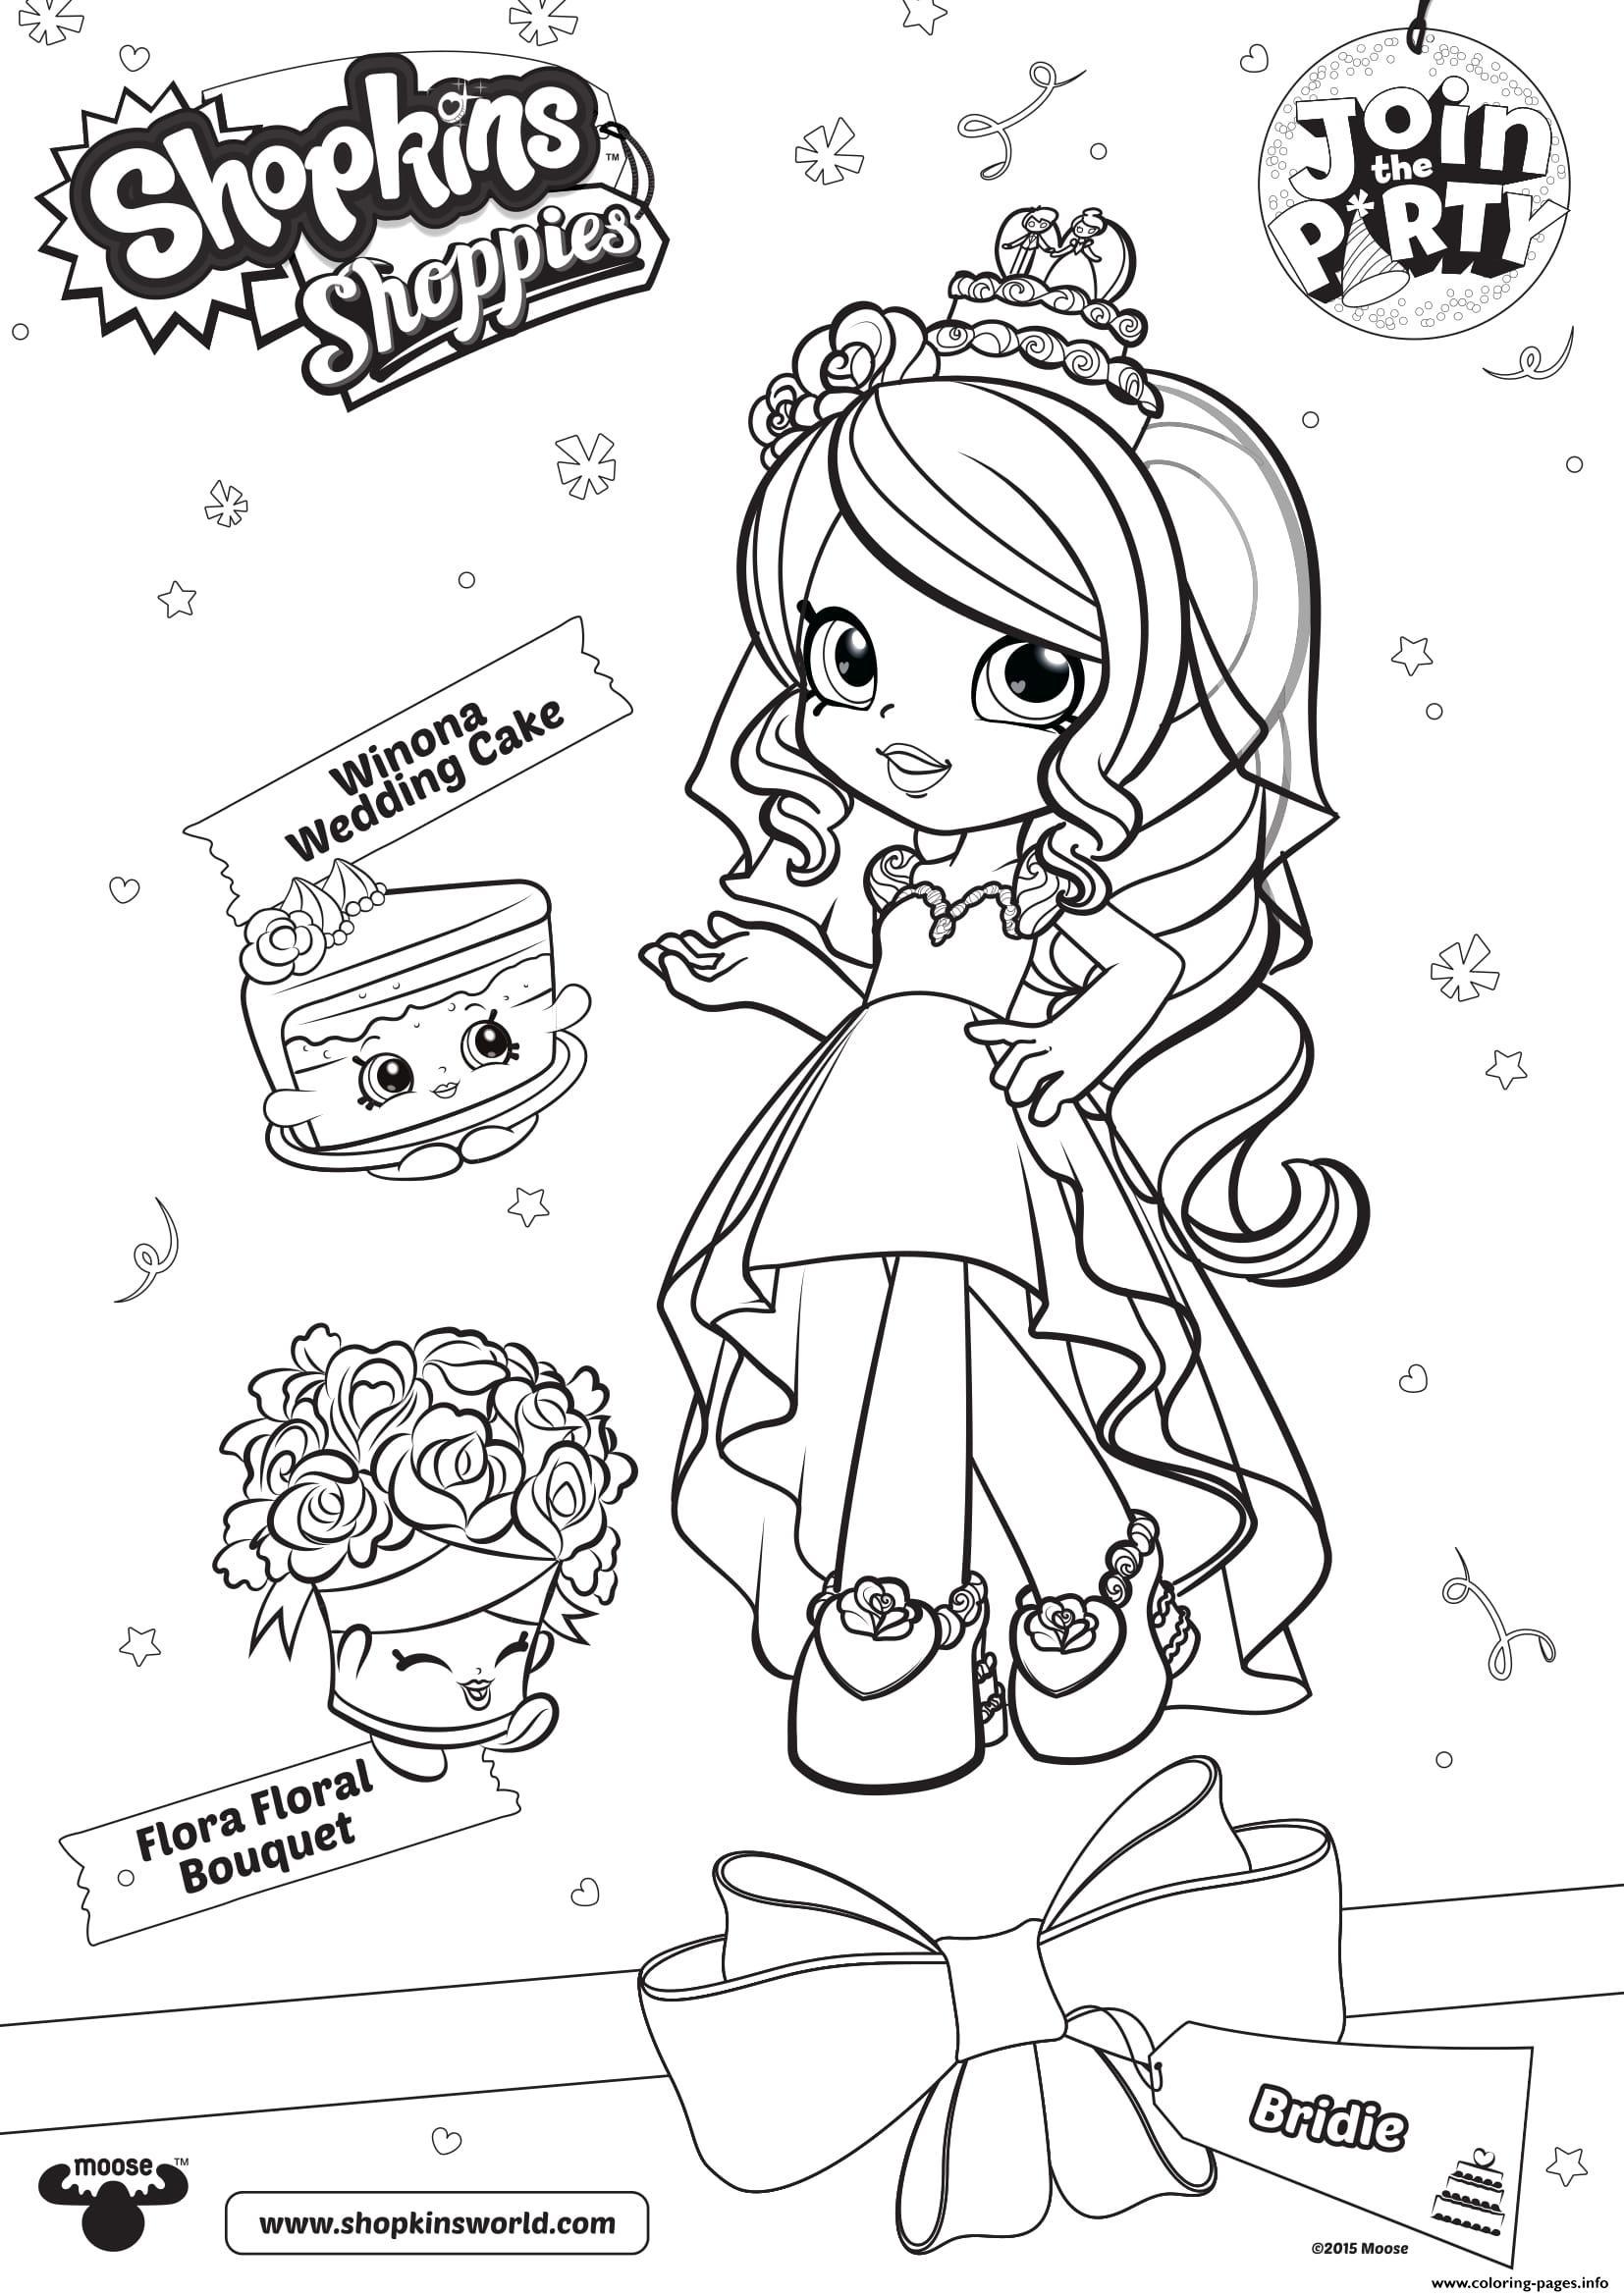 Shopkins Doll Bridie 1 Coloring Pages Printable